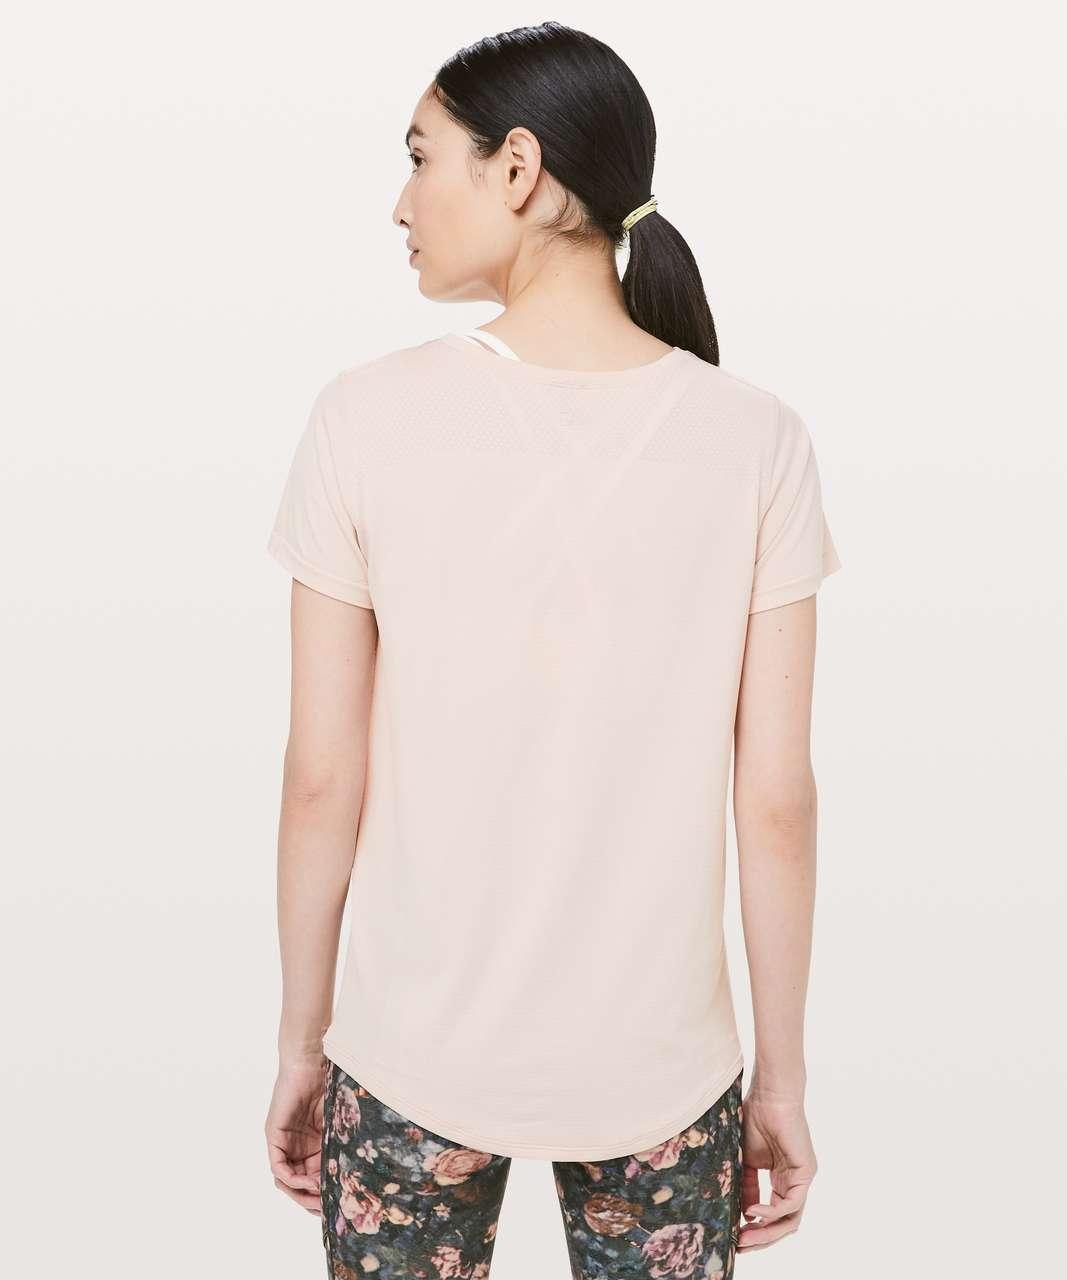 Lululemon Wait For Nothing Short Sleeve - Pink Bliss / White